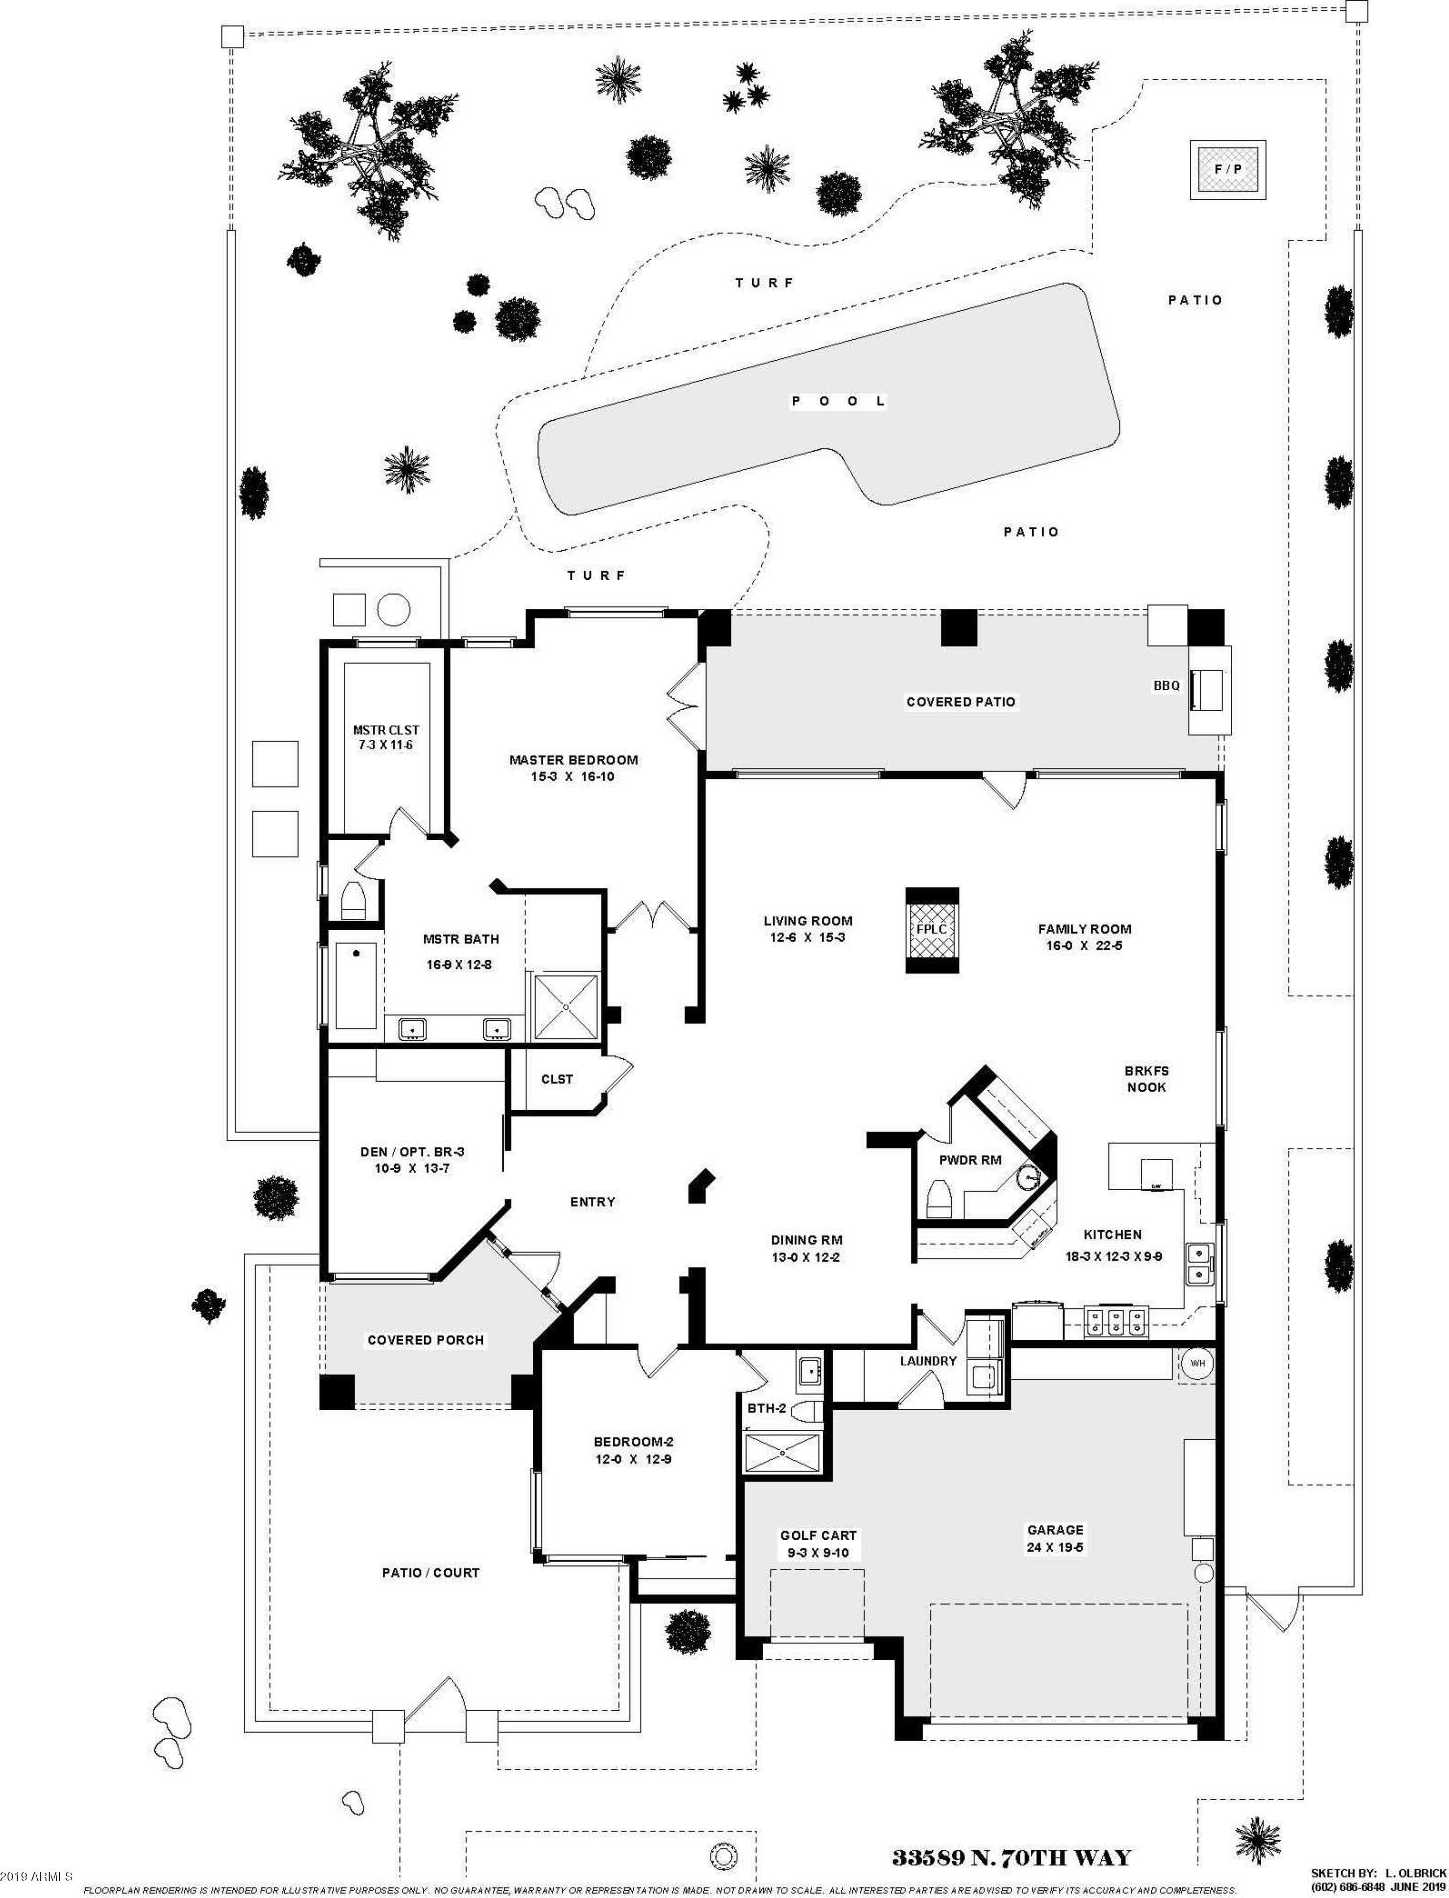 Tomberlin Emerge Wiring Diagram. Parts. Wiring Diagram Images